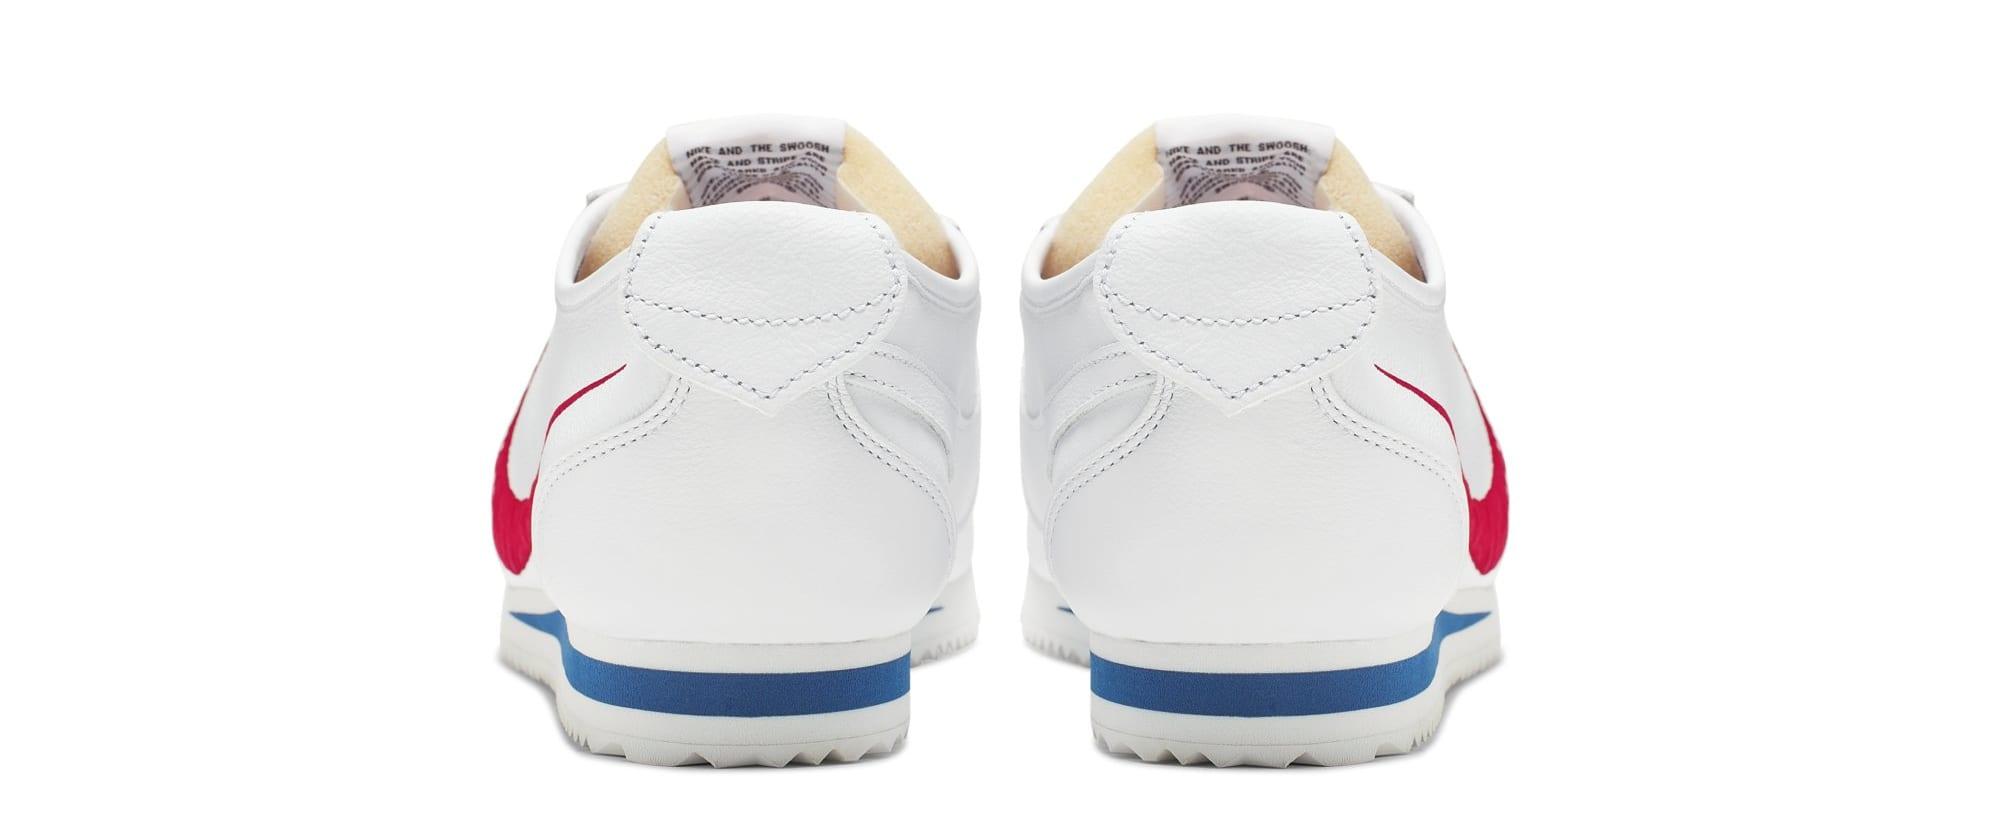 Nike Classic Cortez 'Shoe Dog Pack (Swoosh)' CJ2586-100 (Heel)